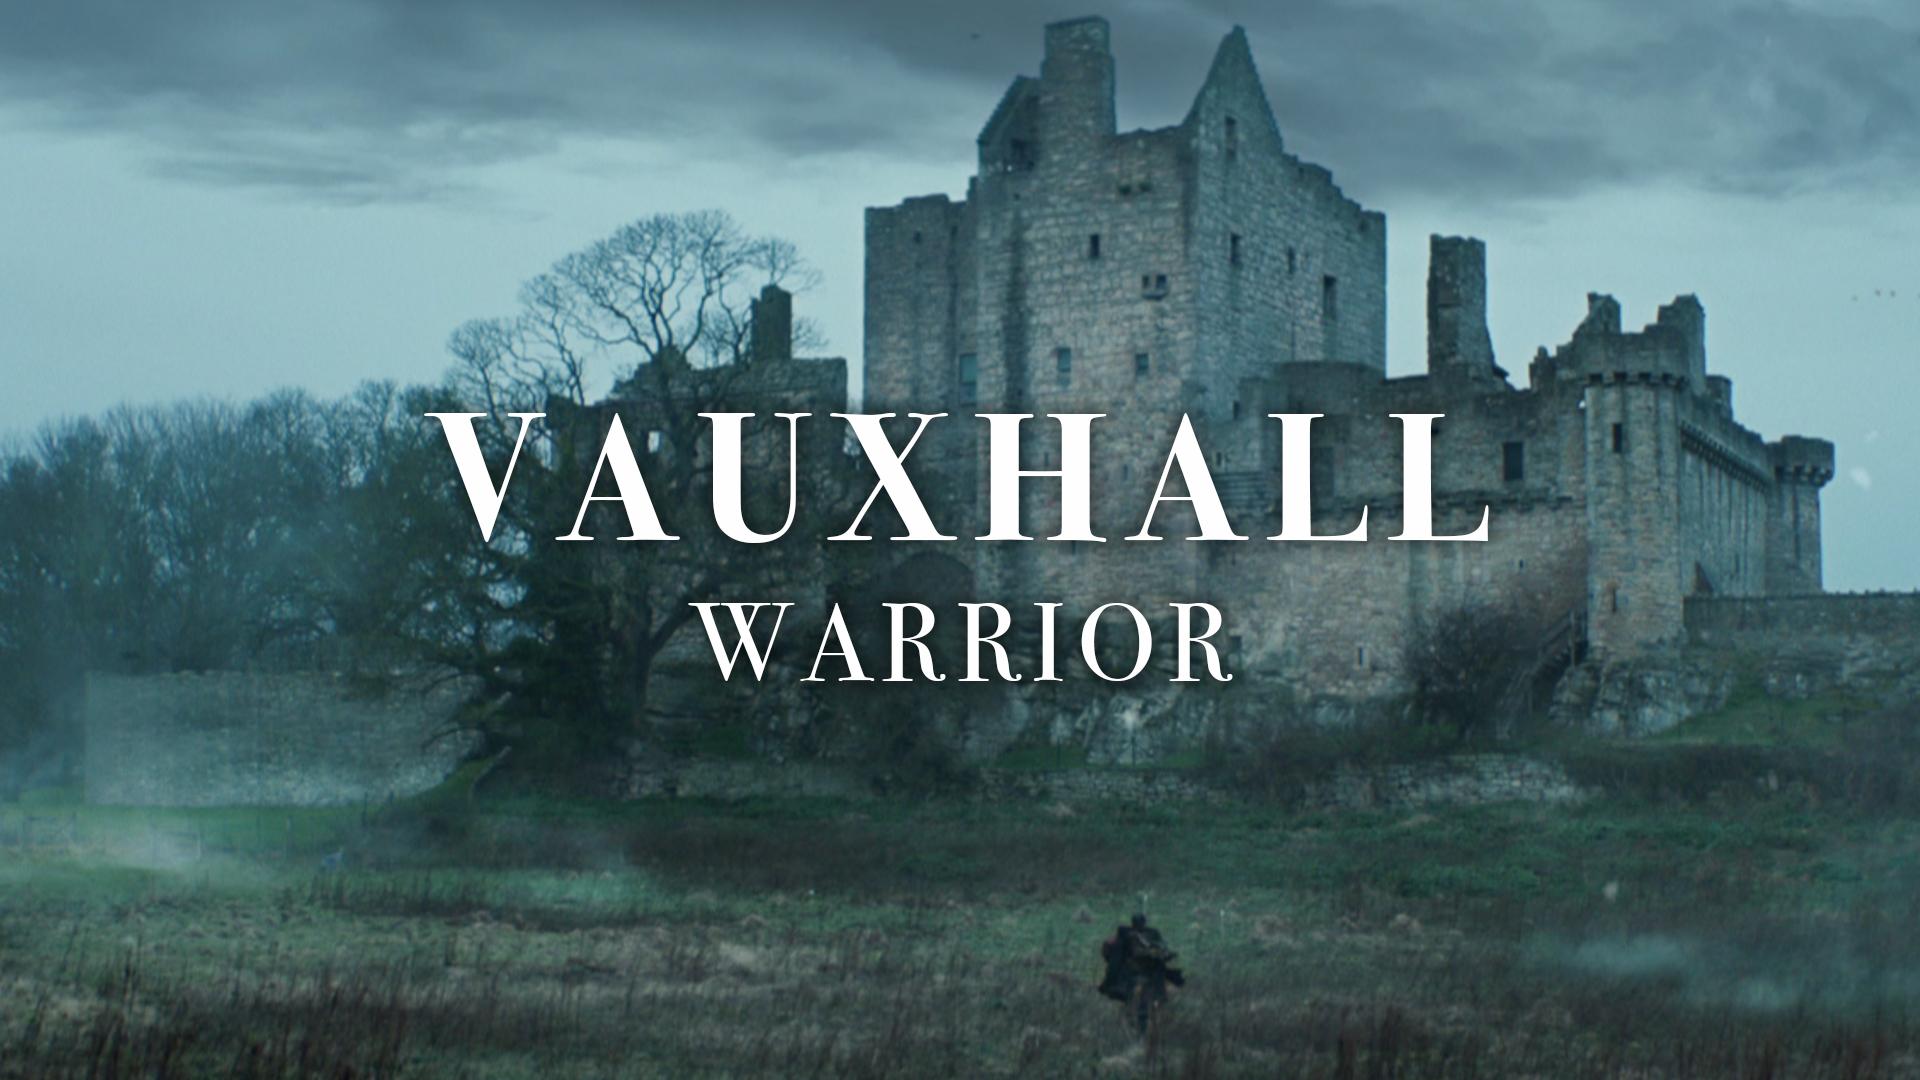 Vauxhall - Warrior